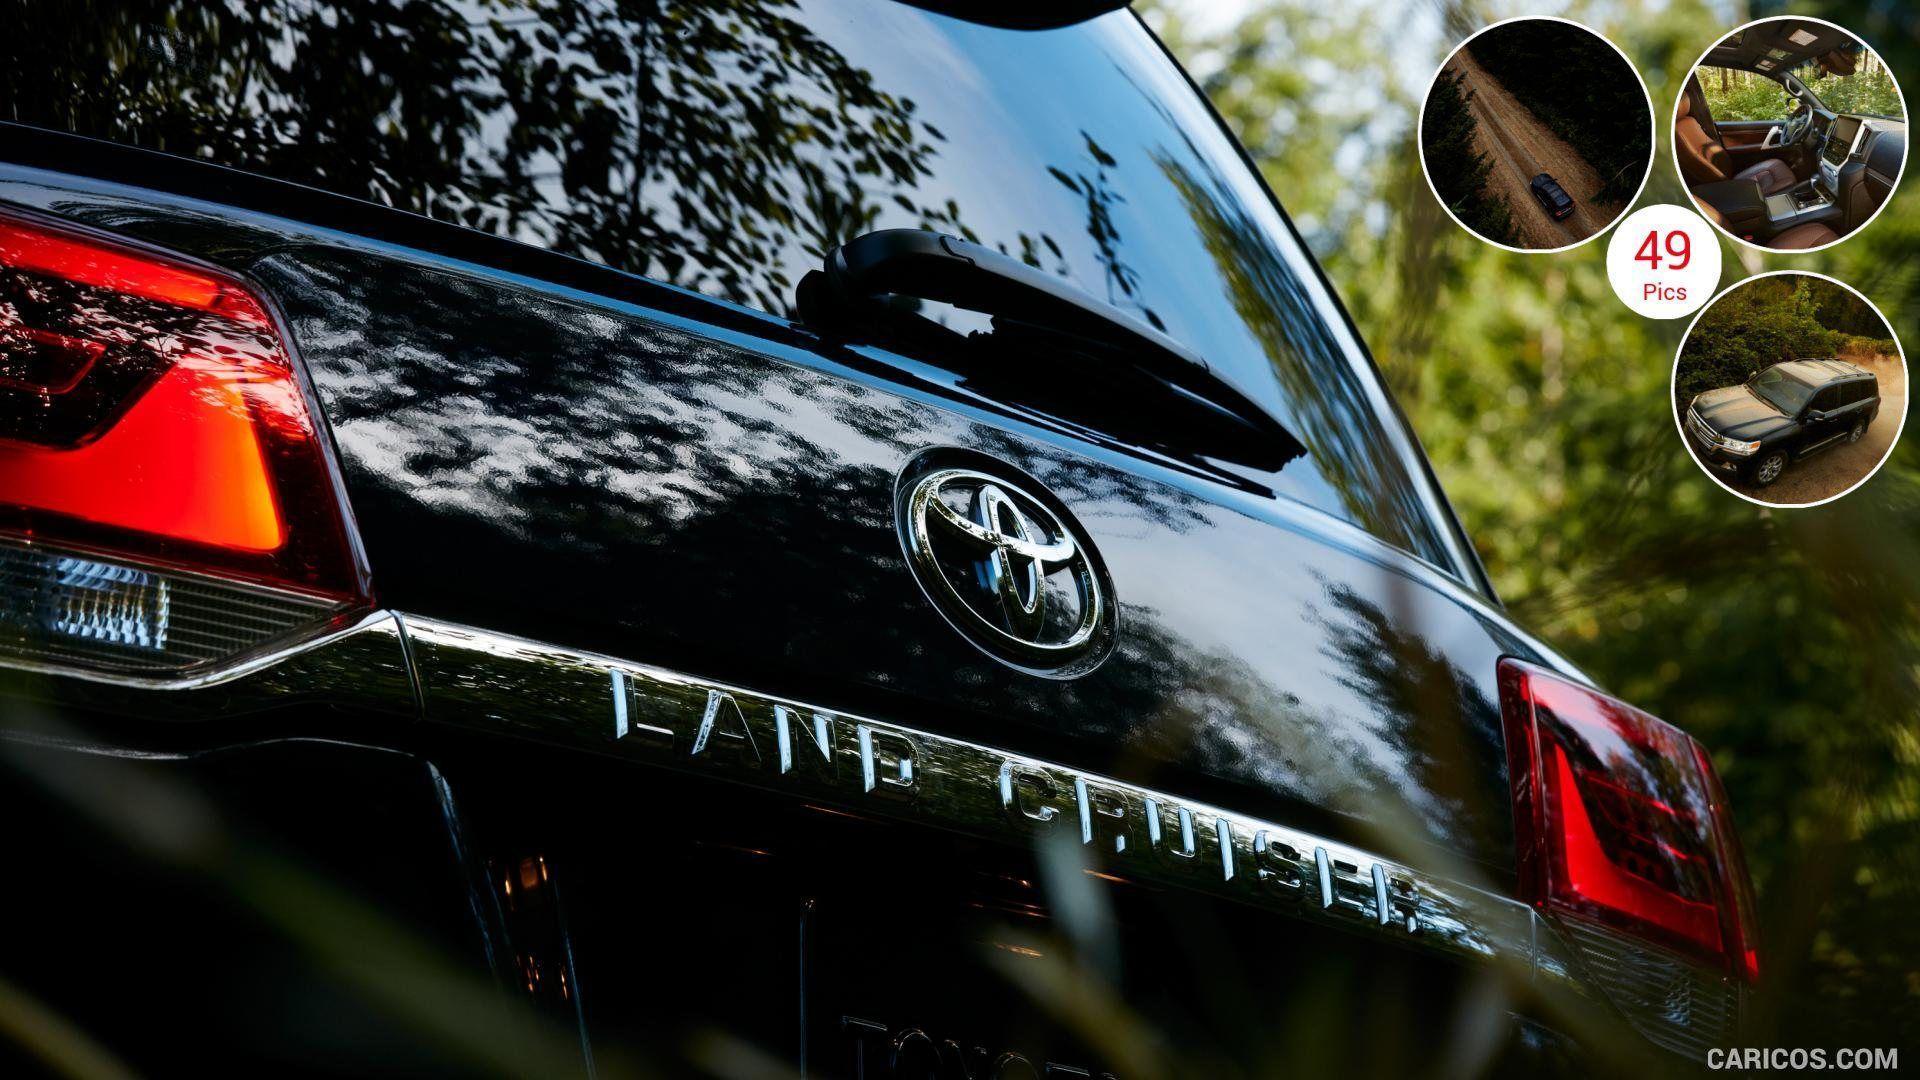 Land cruiser v8 2019 wallpaper toyota cars review - Land cruiser hd wallpaper ...